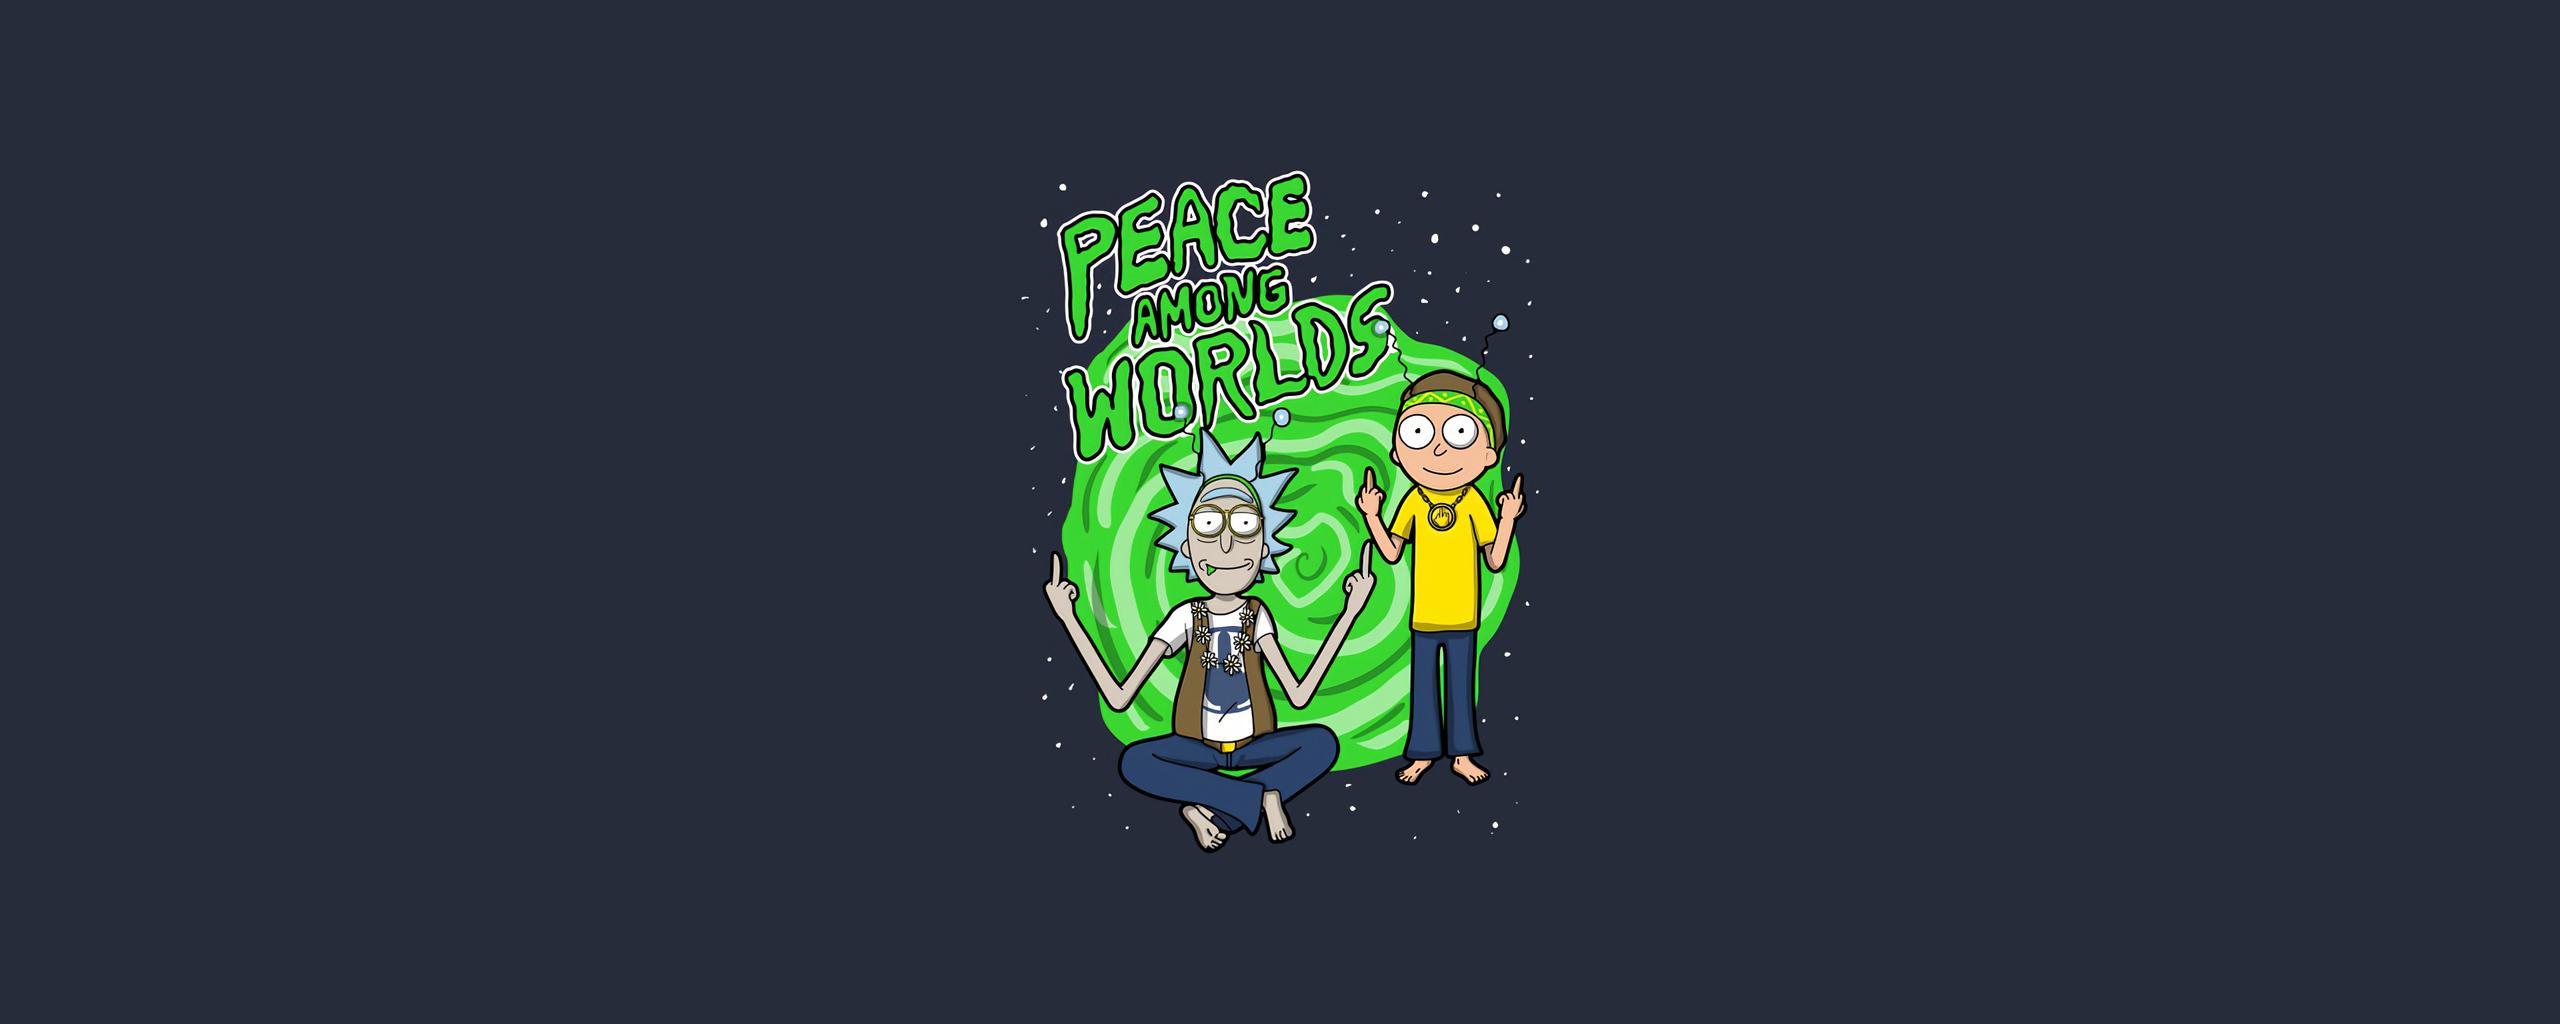 peace-among-words-4k-28.jpg